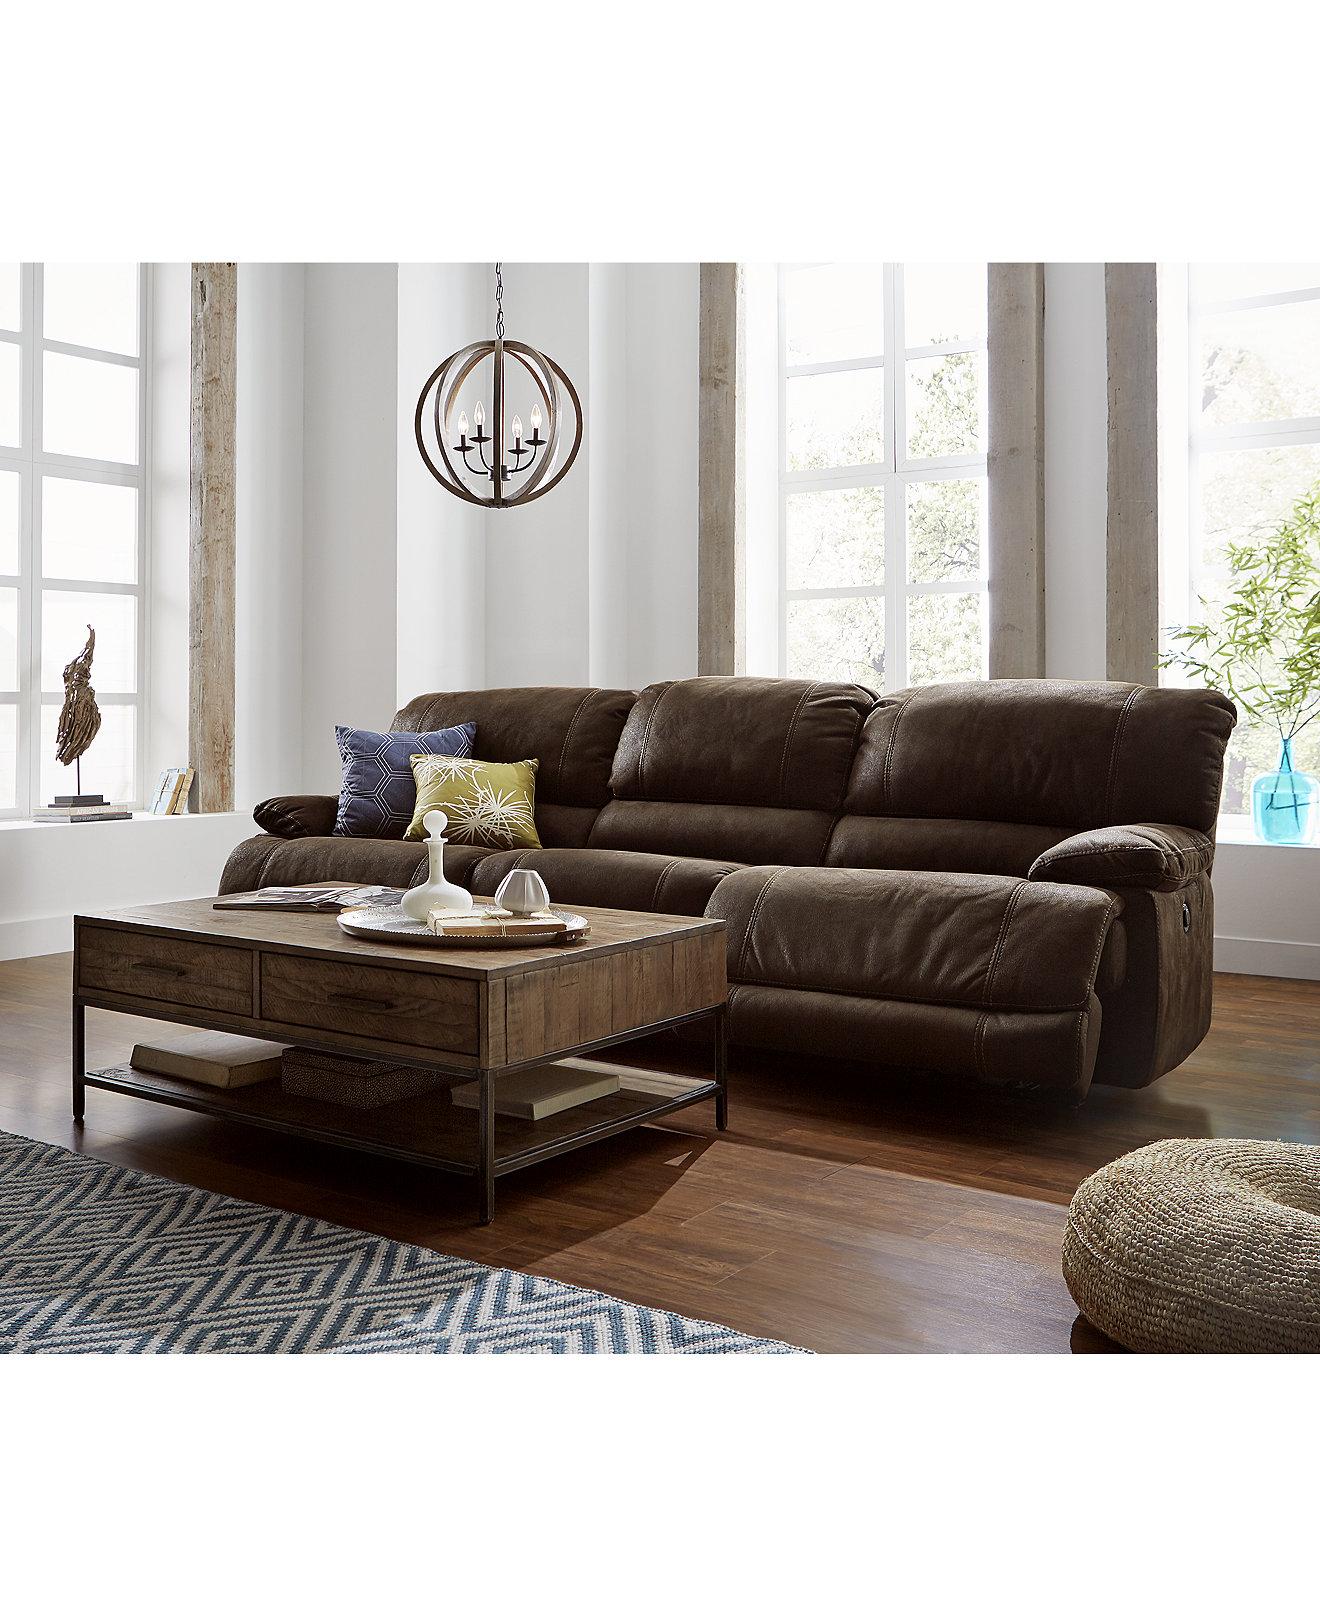 Thomasville Living Room Furniture Thomasville Furniture Shop For And Buy Thomasville Furniture